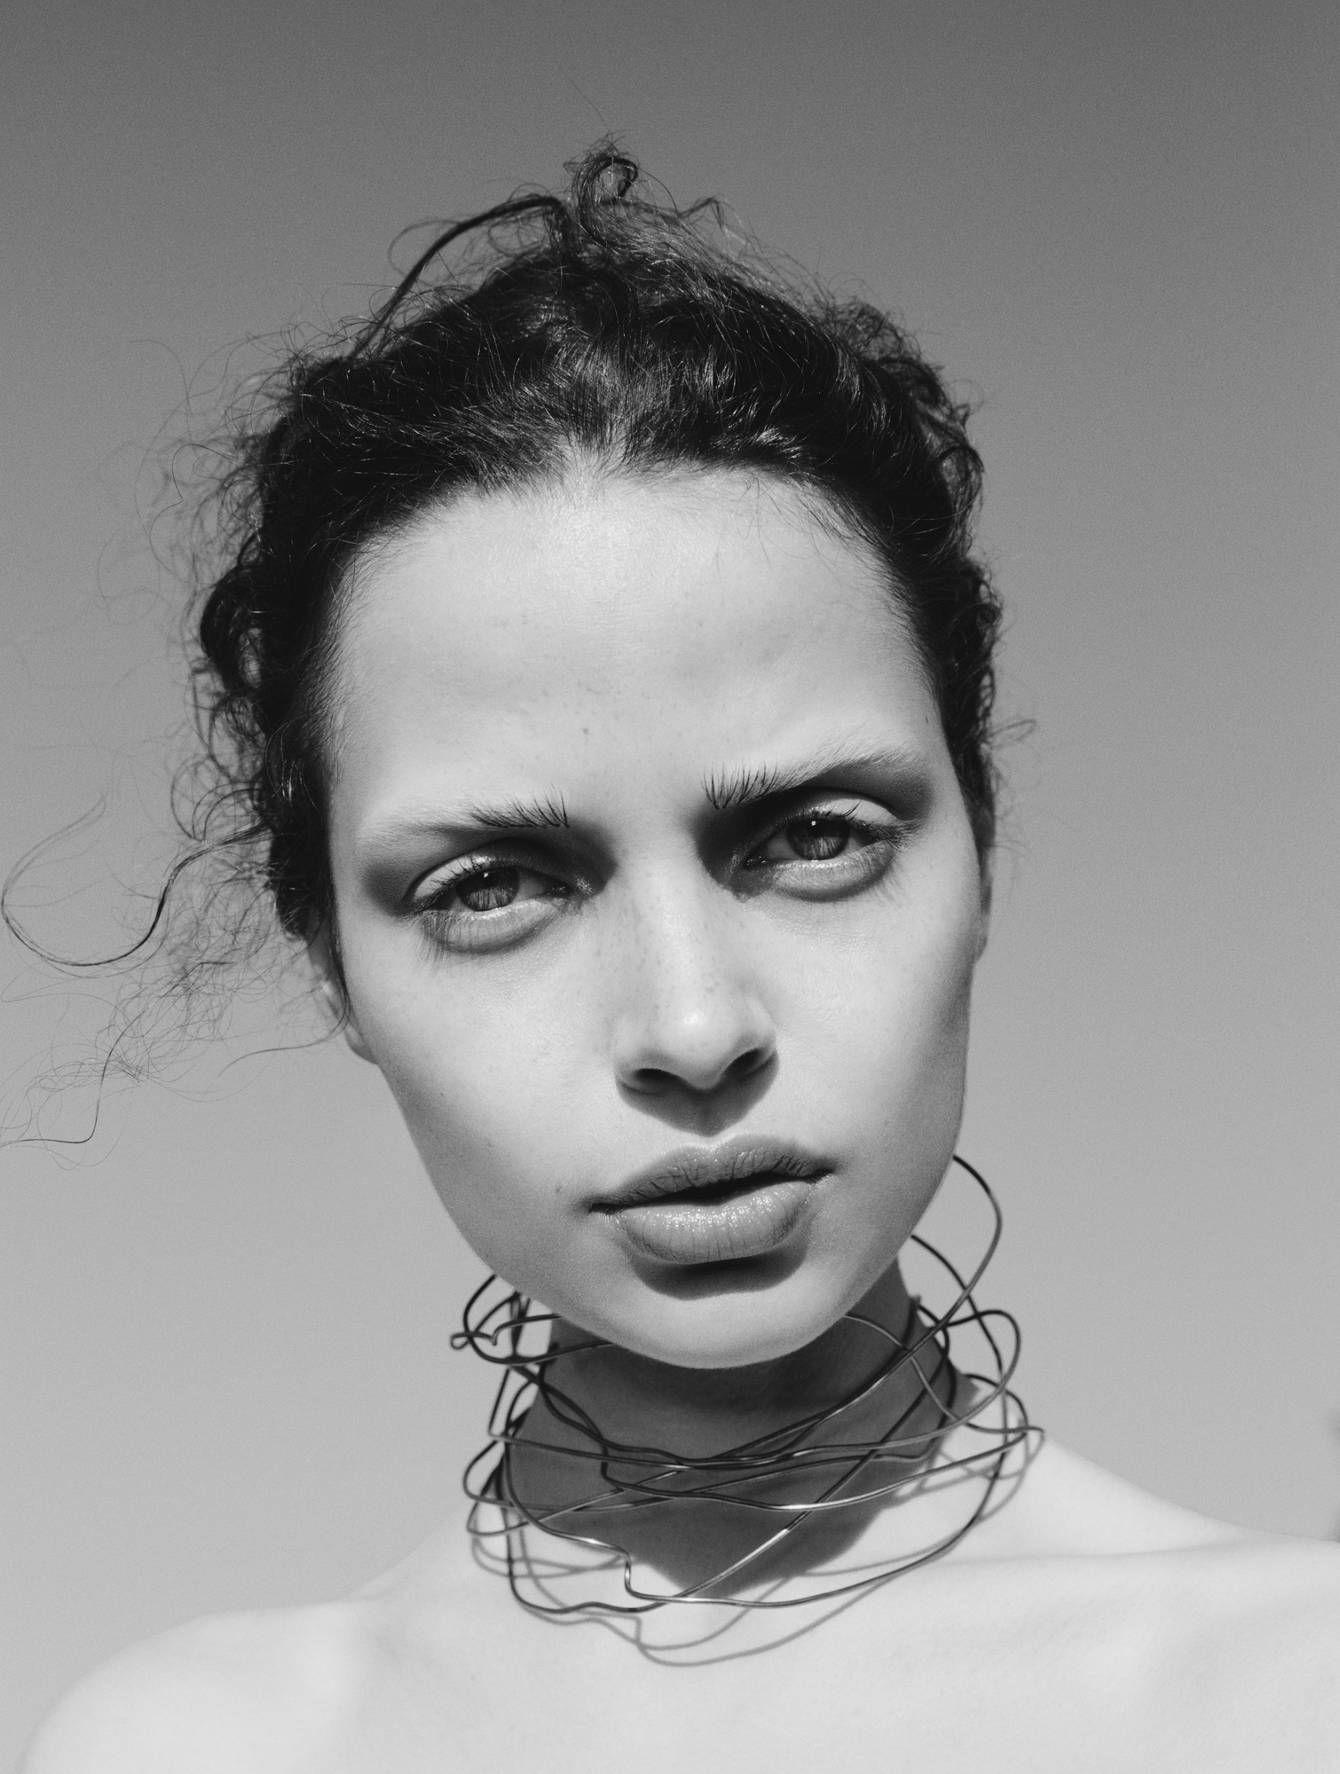 Personal portrait rebeka breymas photographer benjamin vnuk